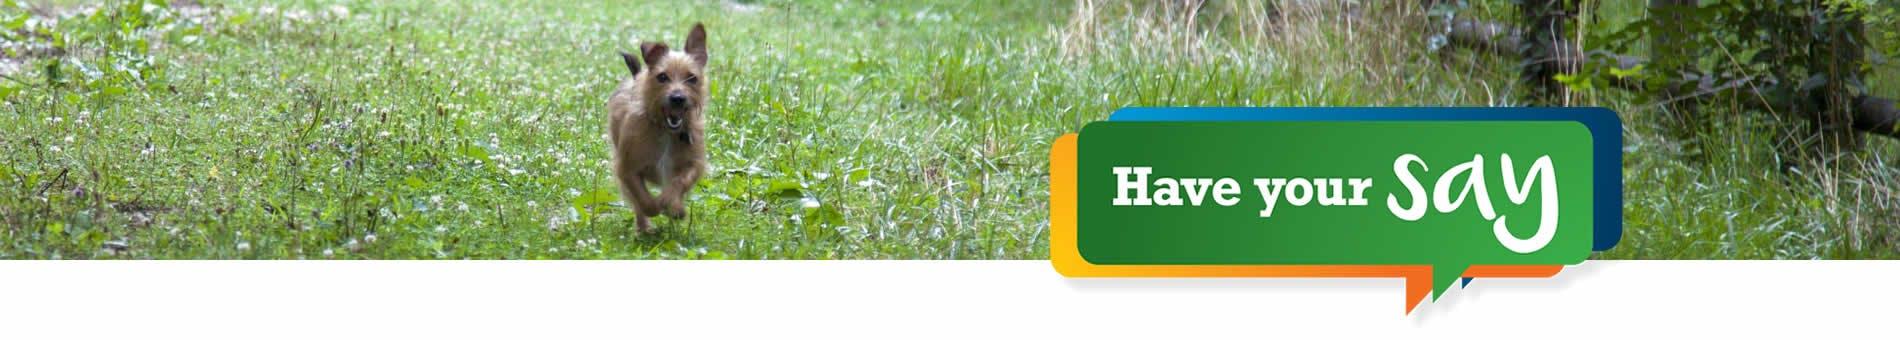 dog running in a green grassy field